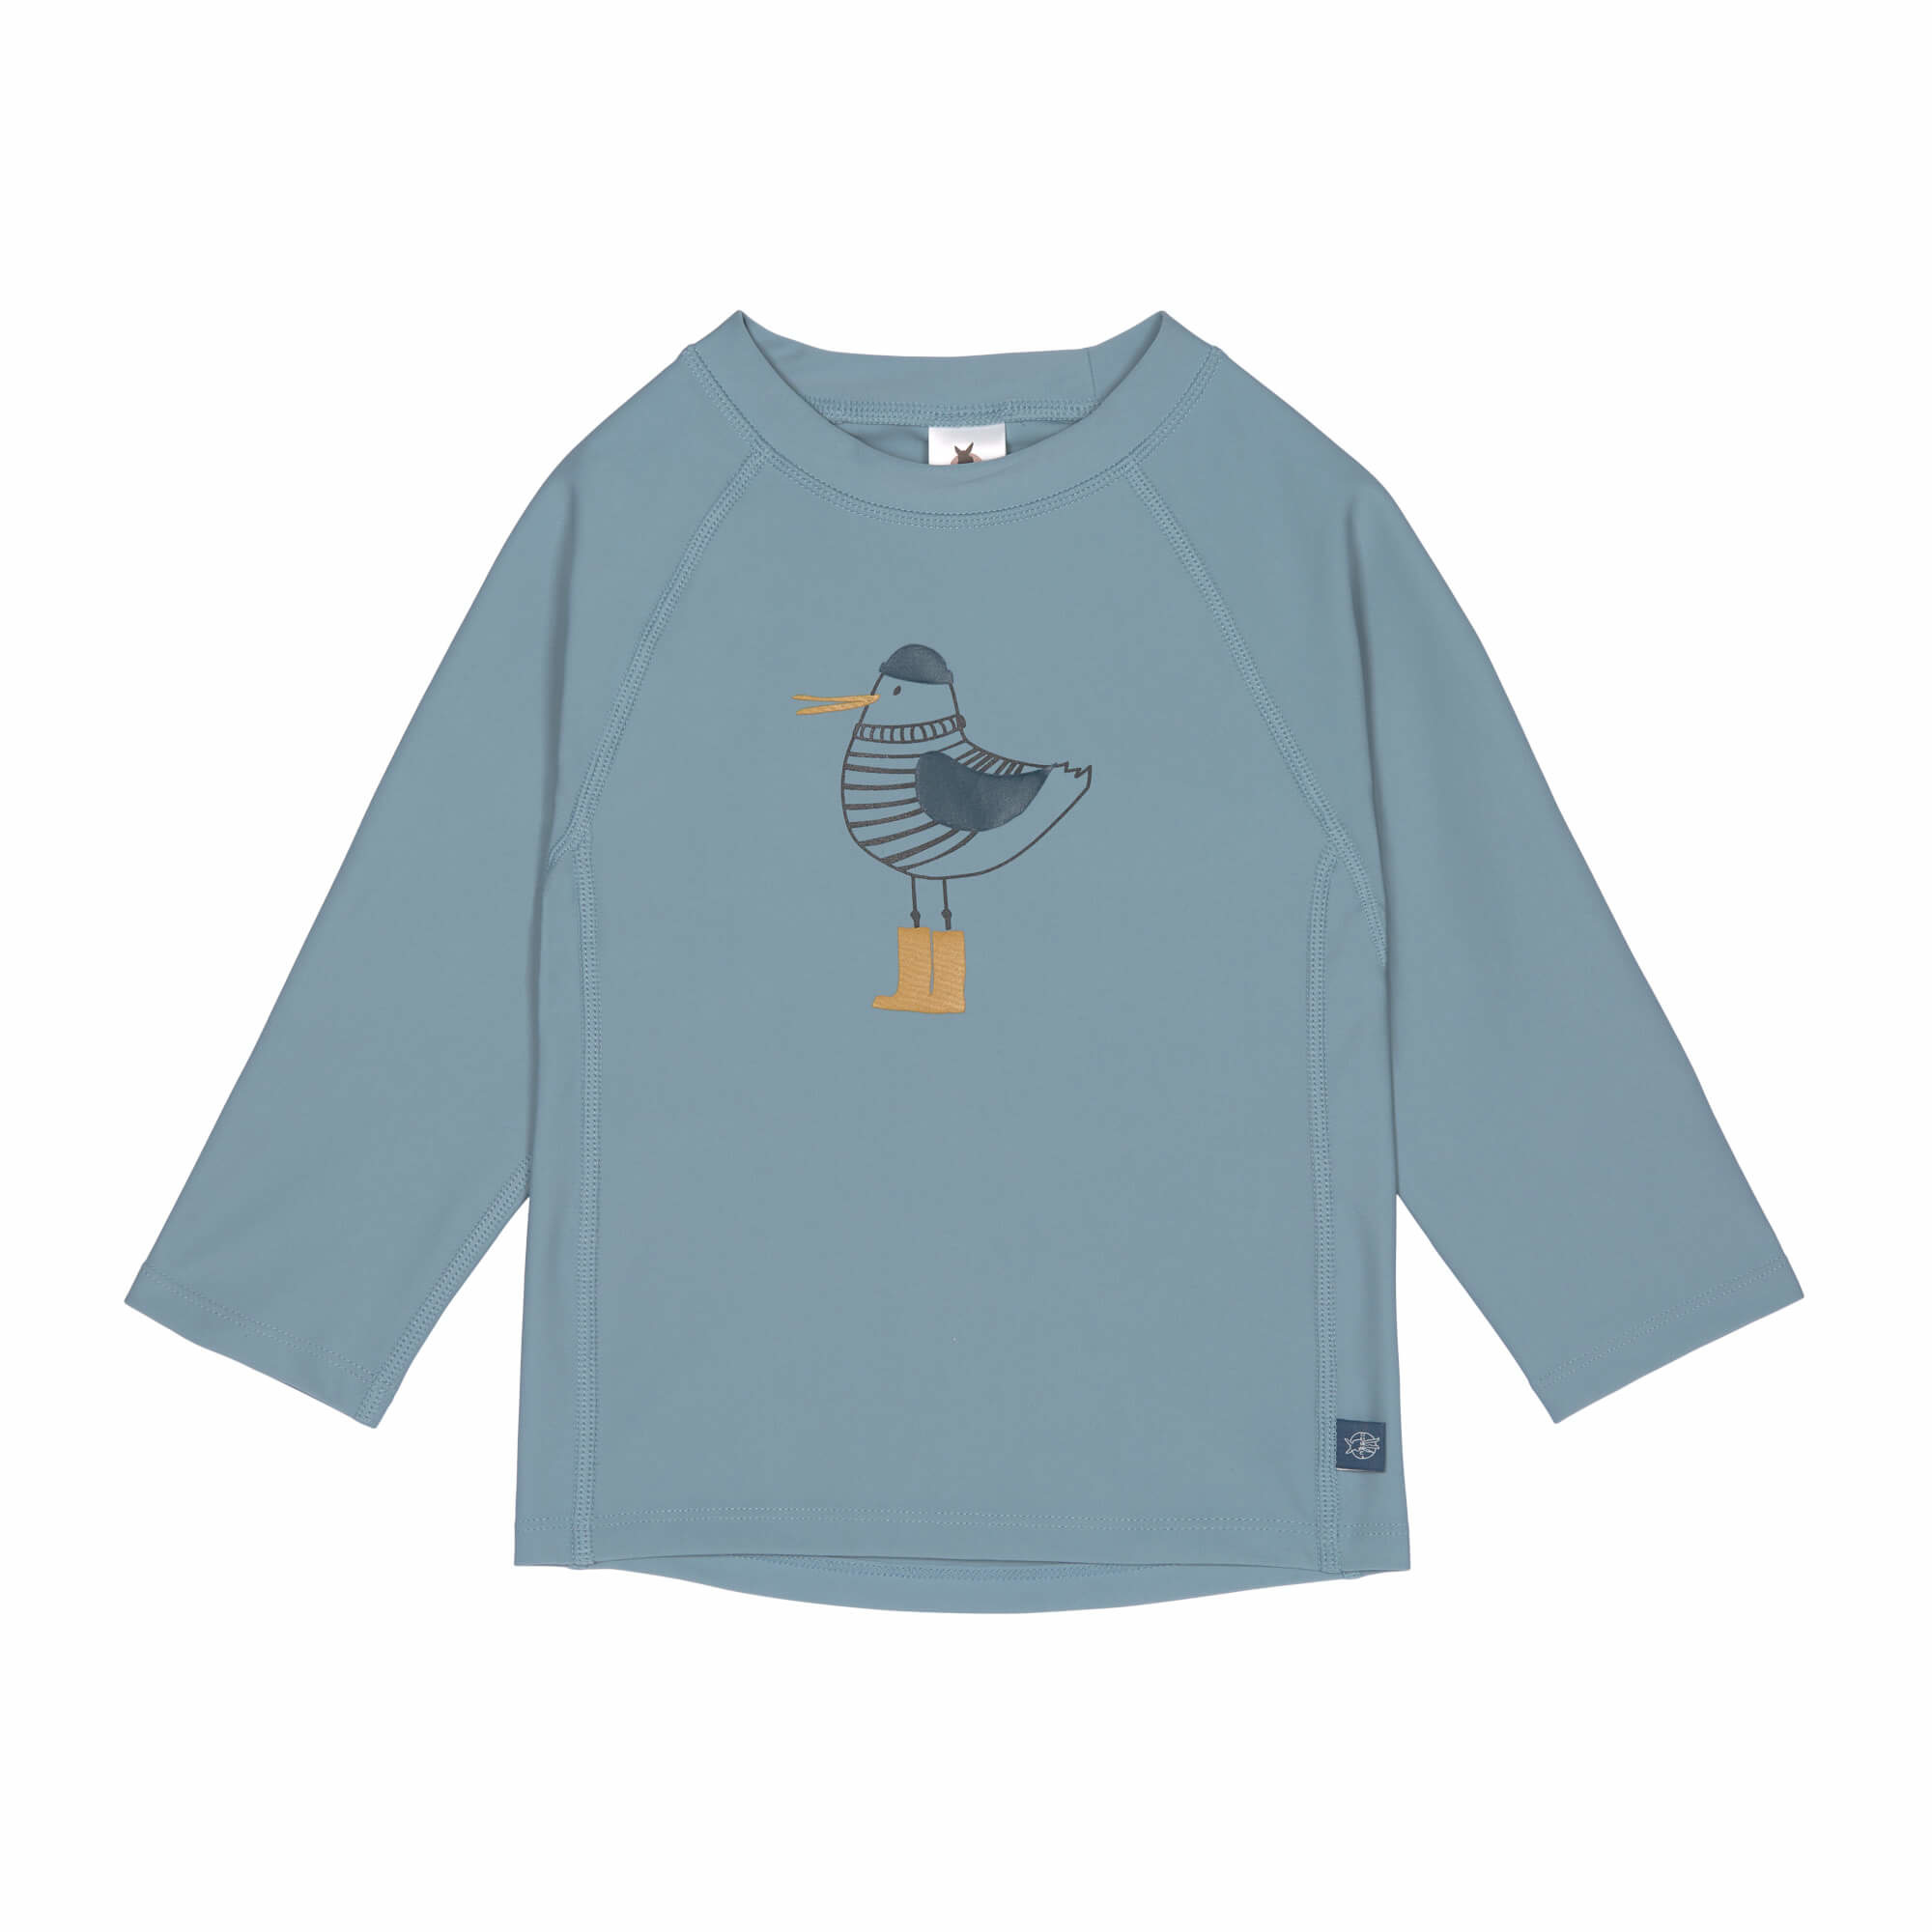 Lässig Lässig Splash & Fun Lange mouw Rashguard / zwemshirt Mr. Seagull blue